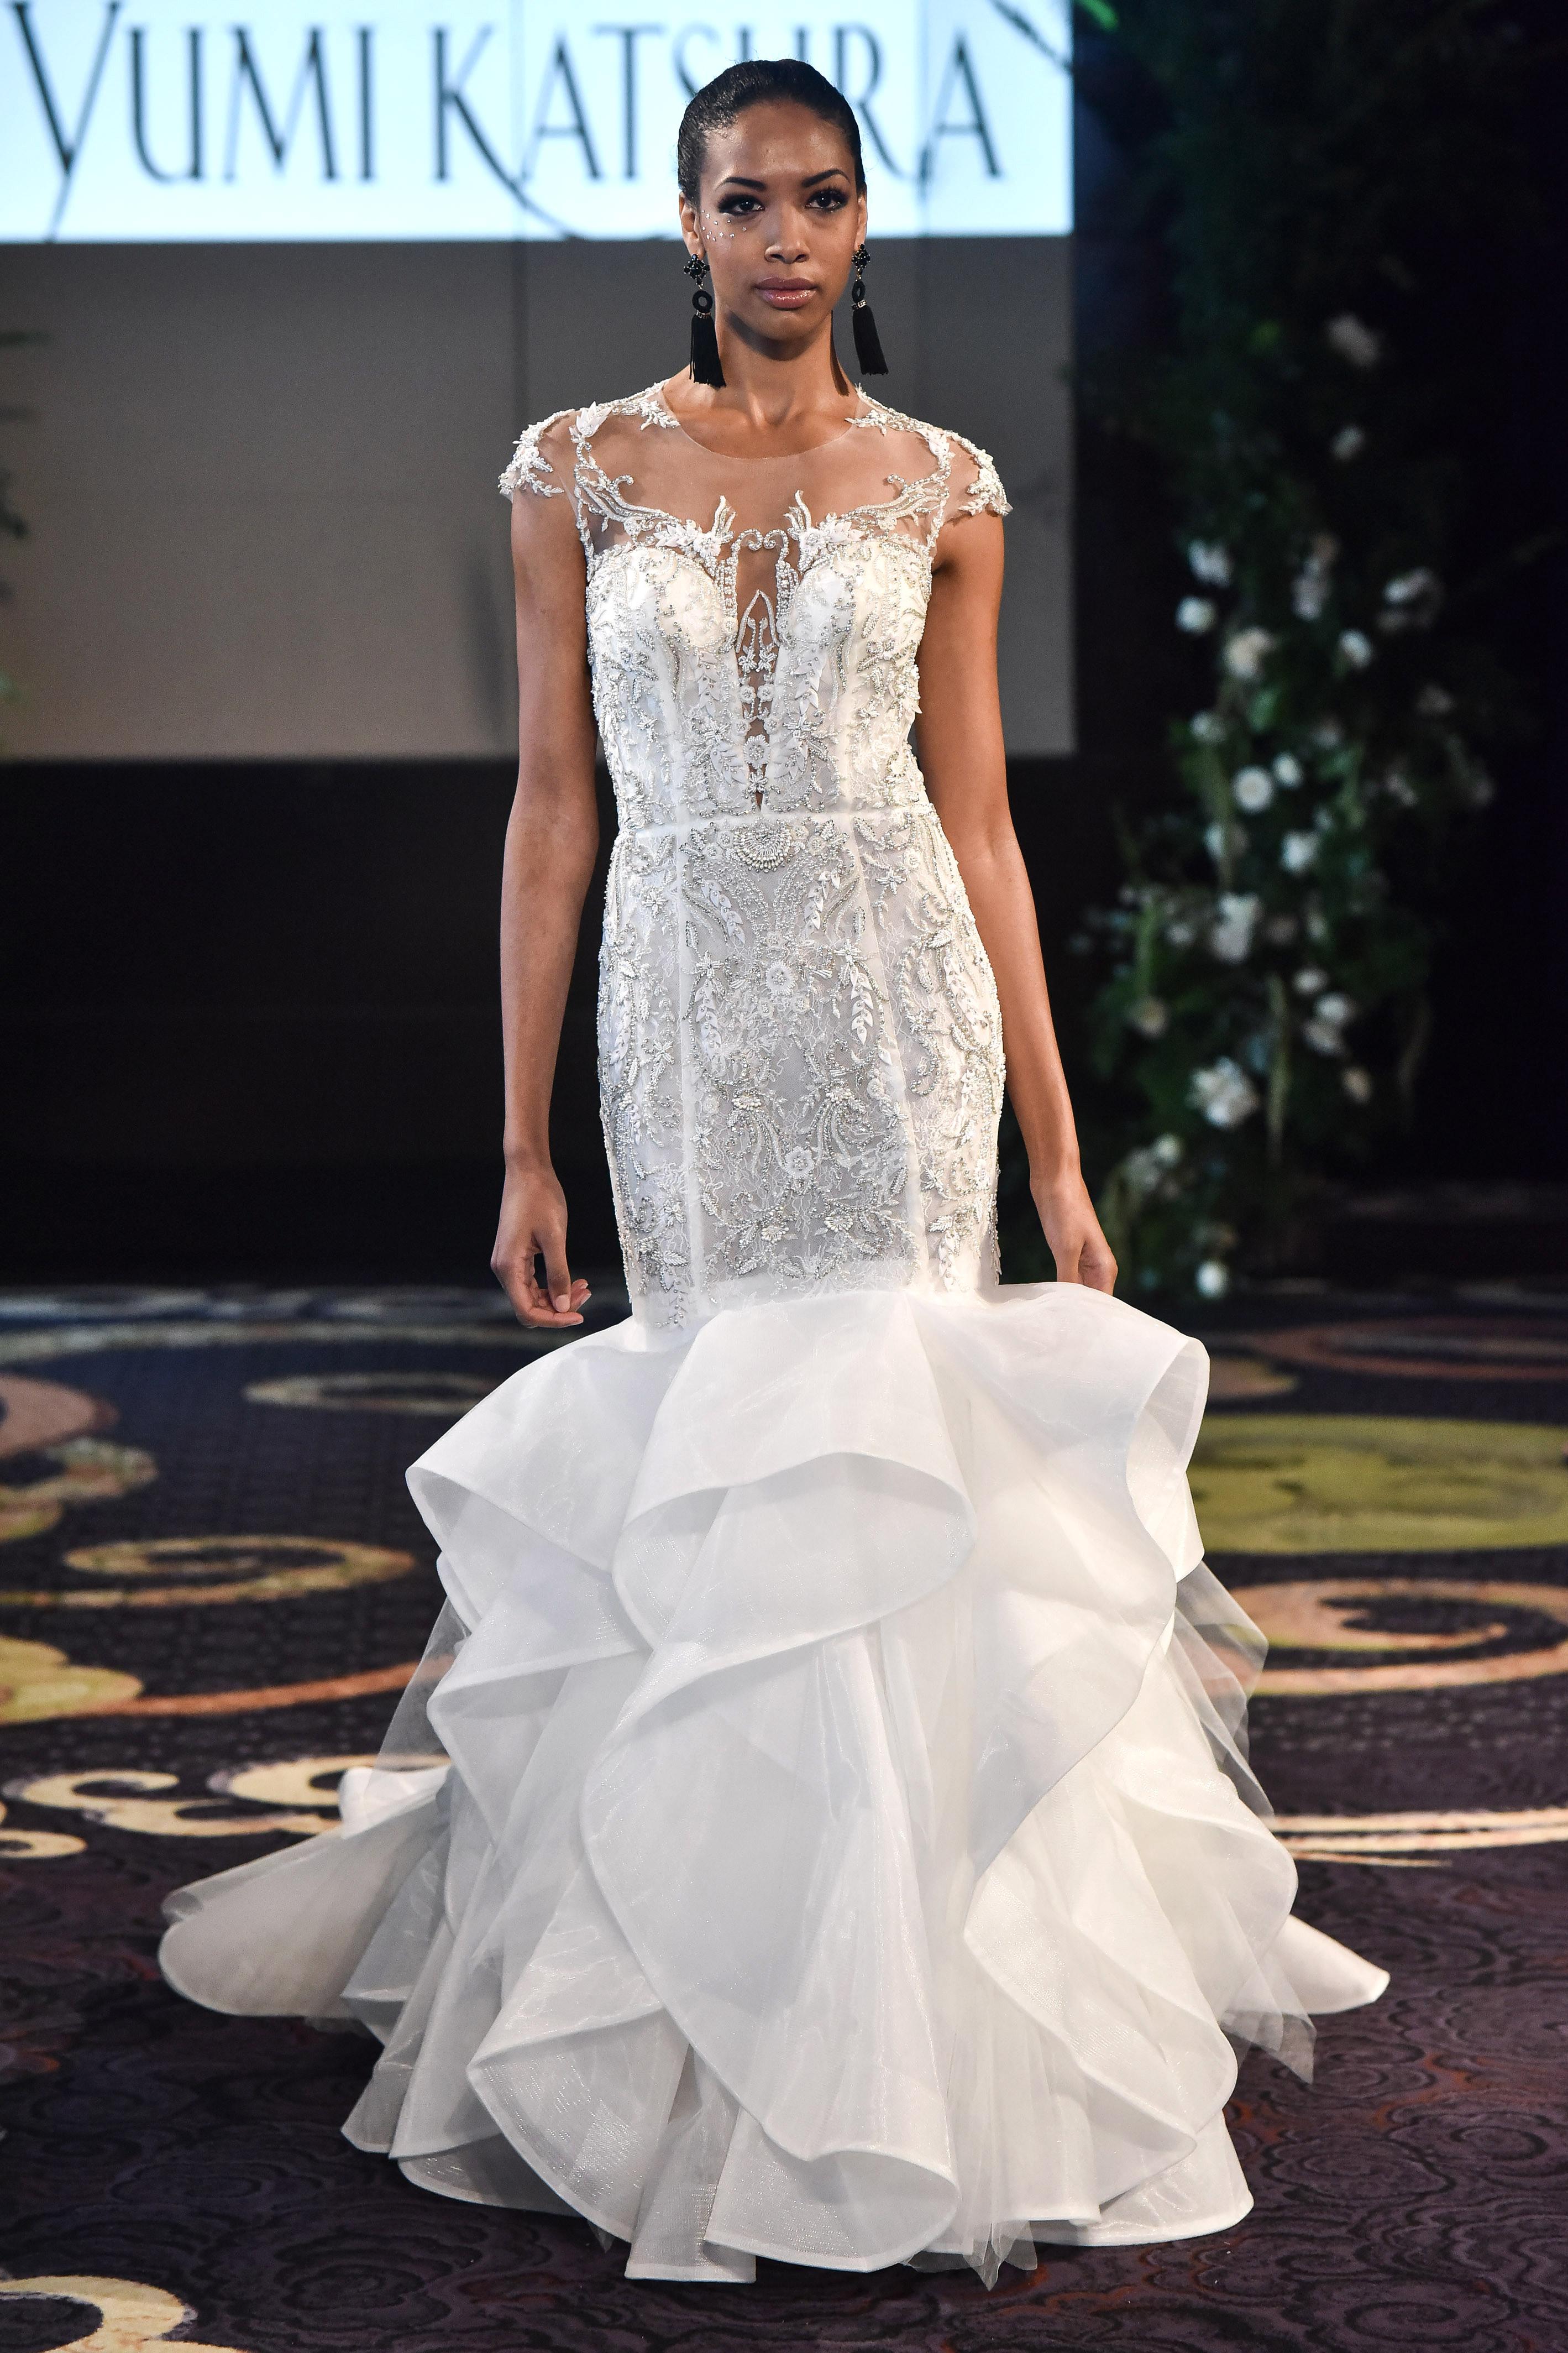 yumi katsura fall 2018 jewel embellished trumpet wedding dress